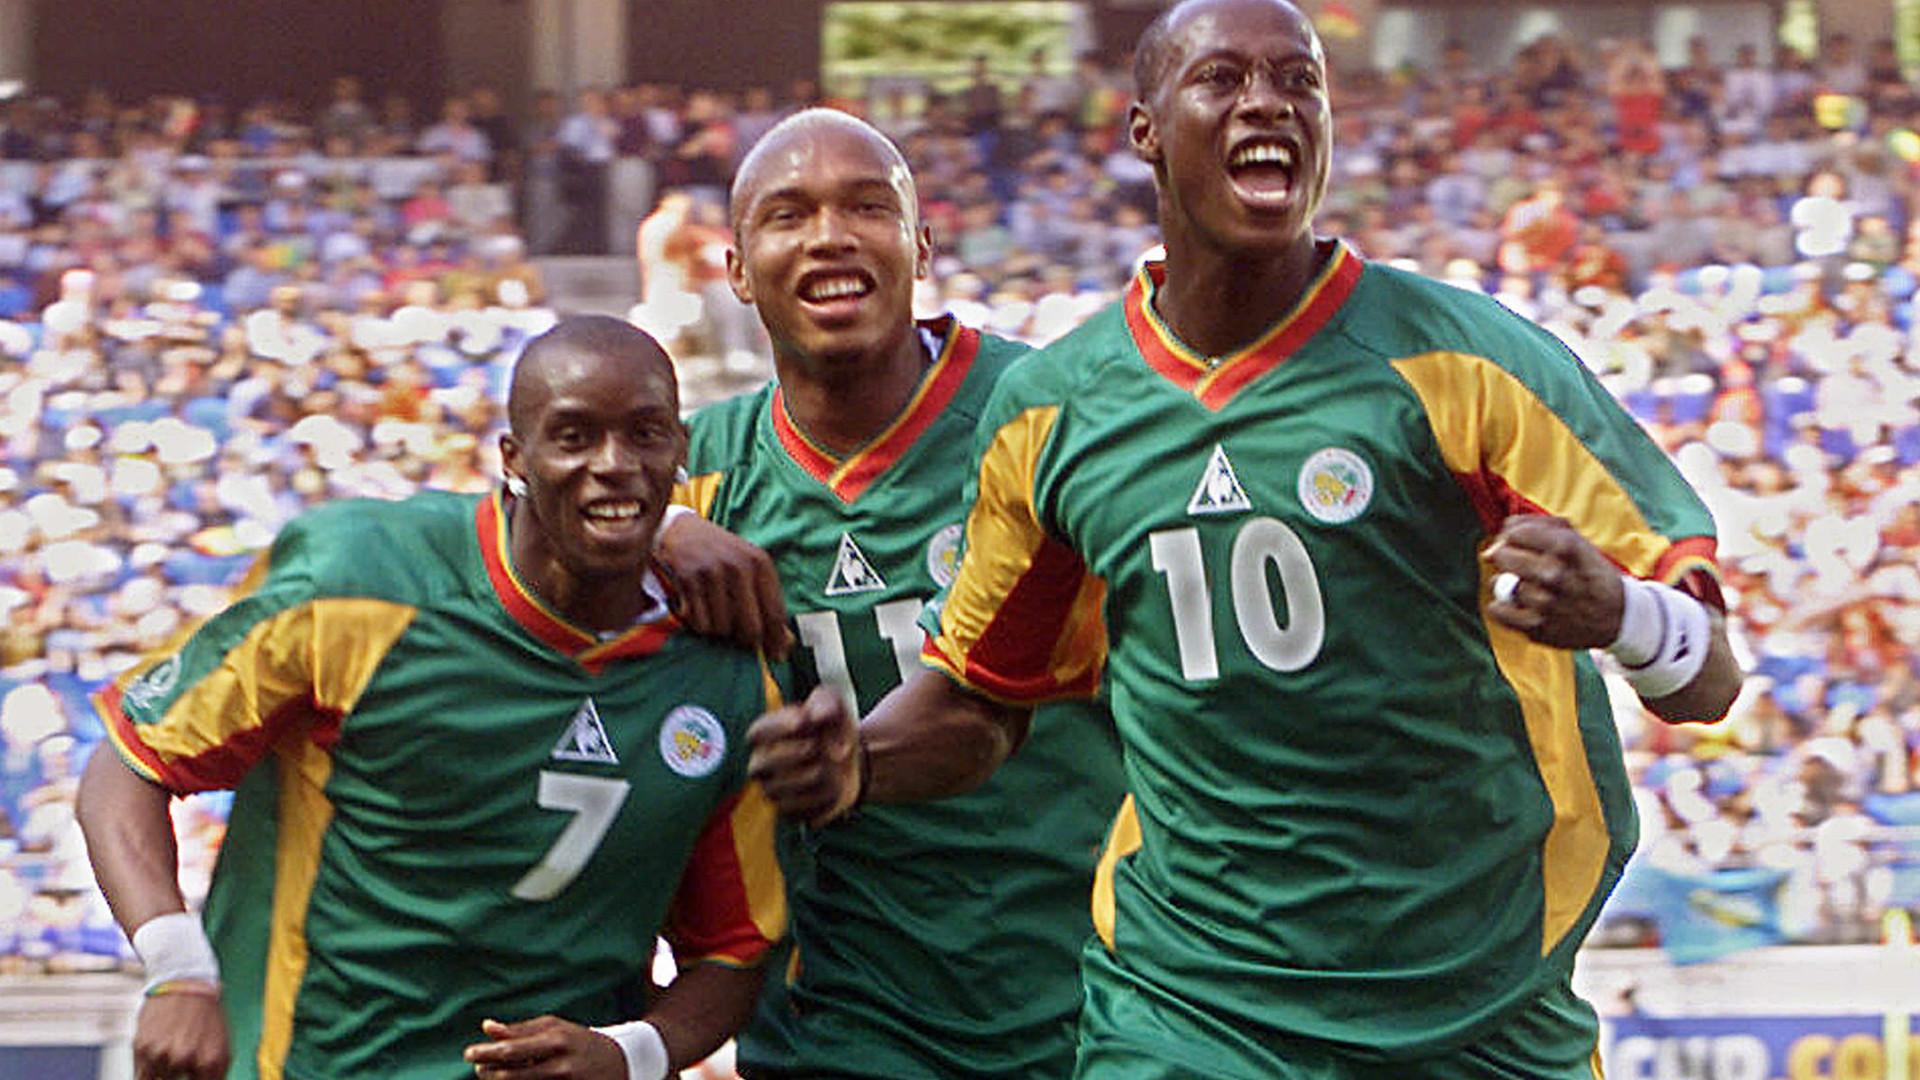 Diouf Fadiga Camara Senegal 2002